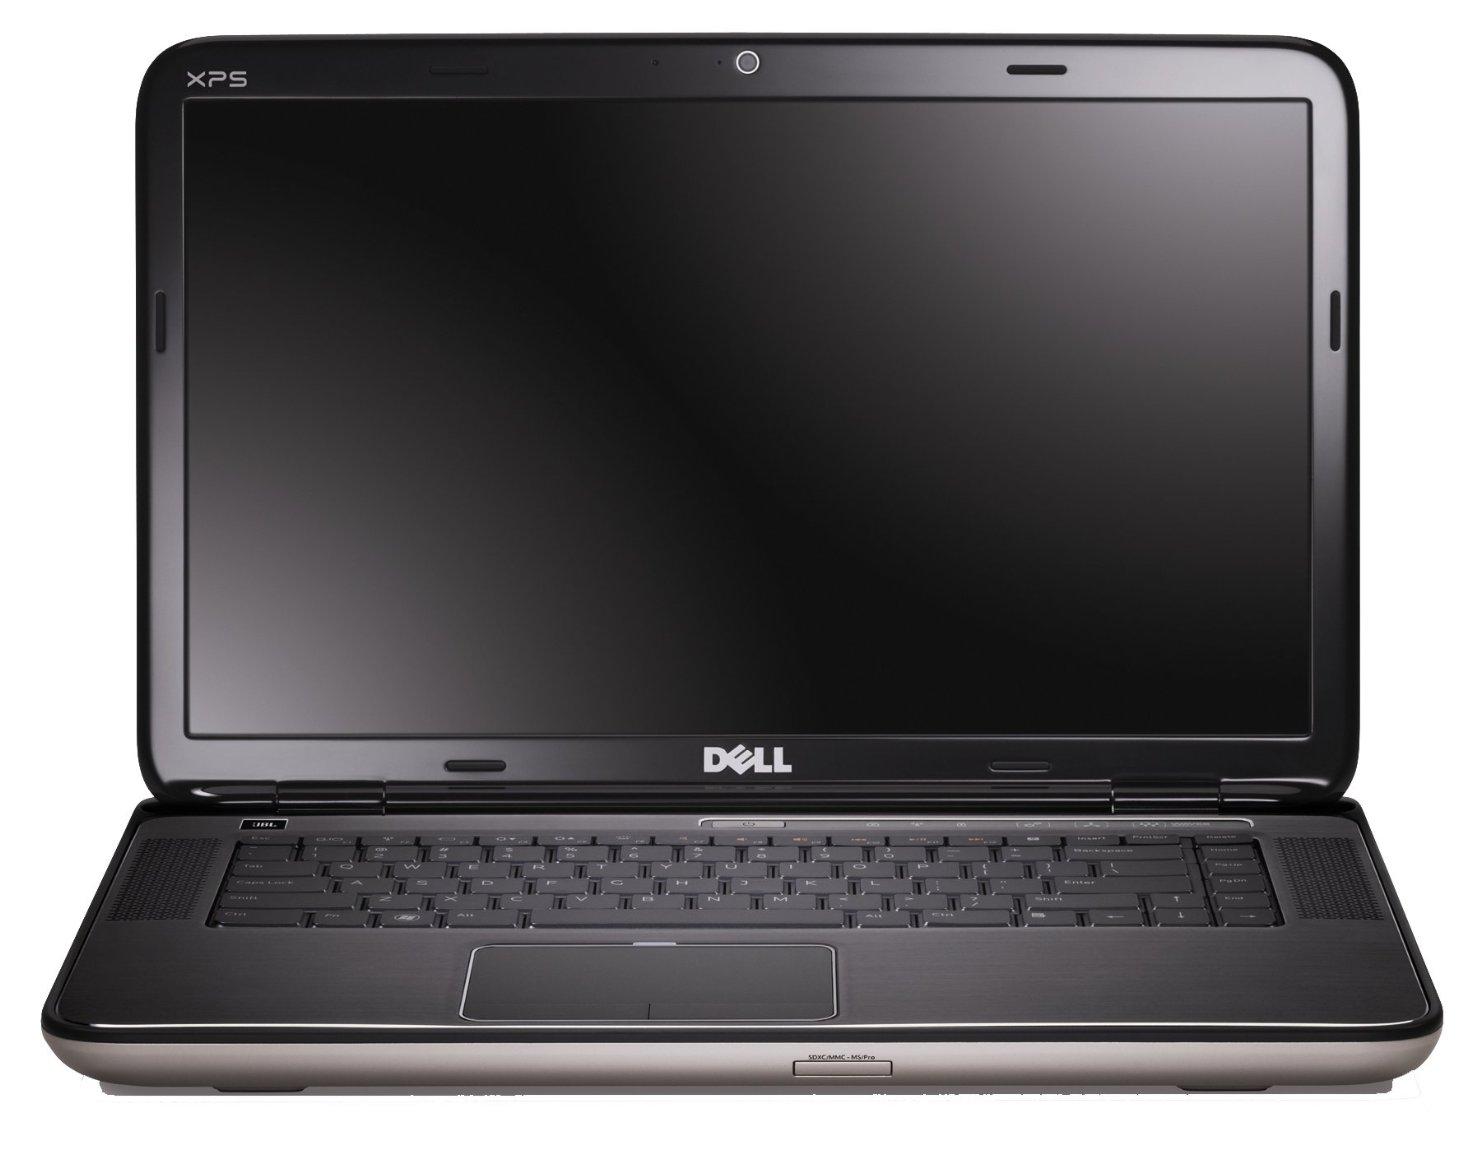 Купить Ноутбук Dell XPS 15 (9570-1073) фото 1